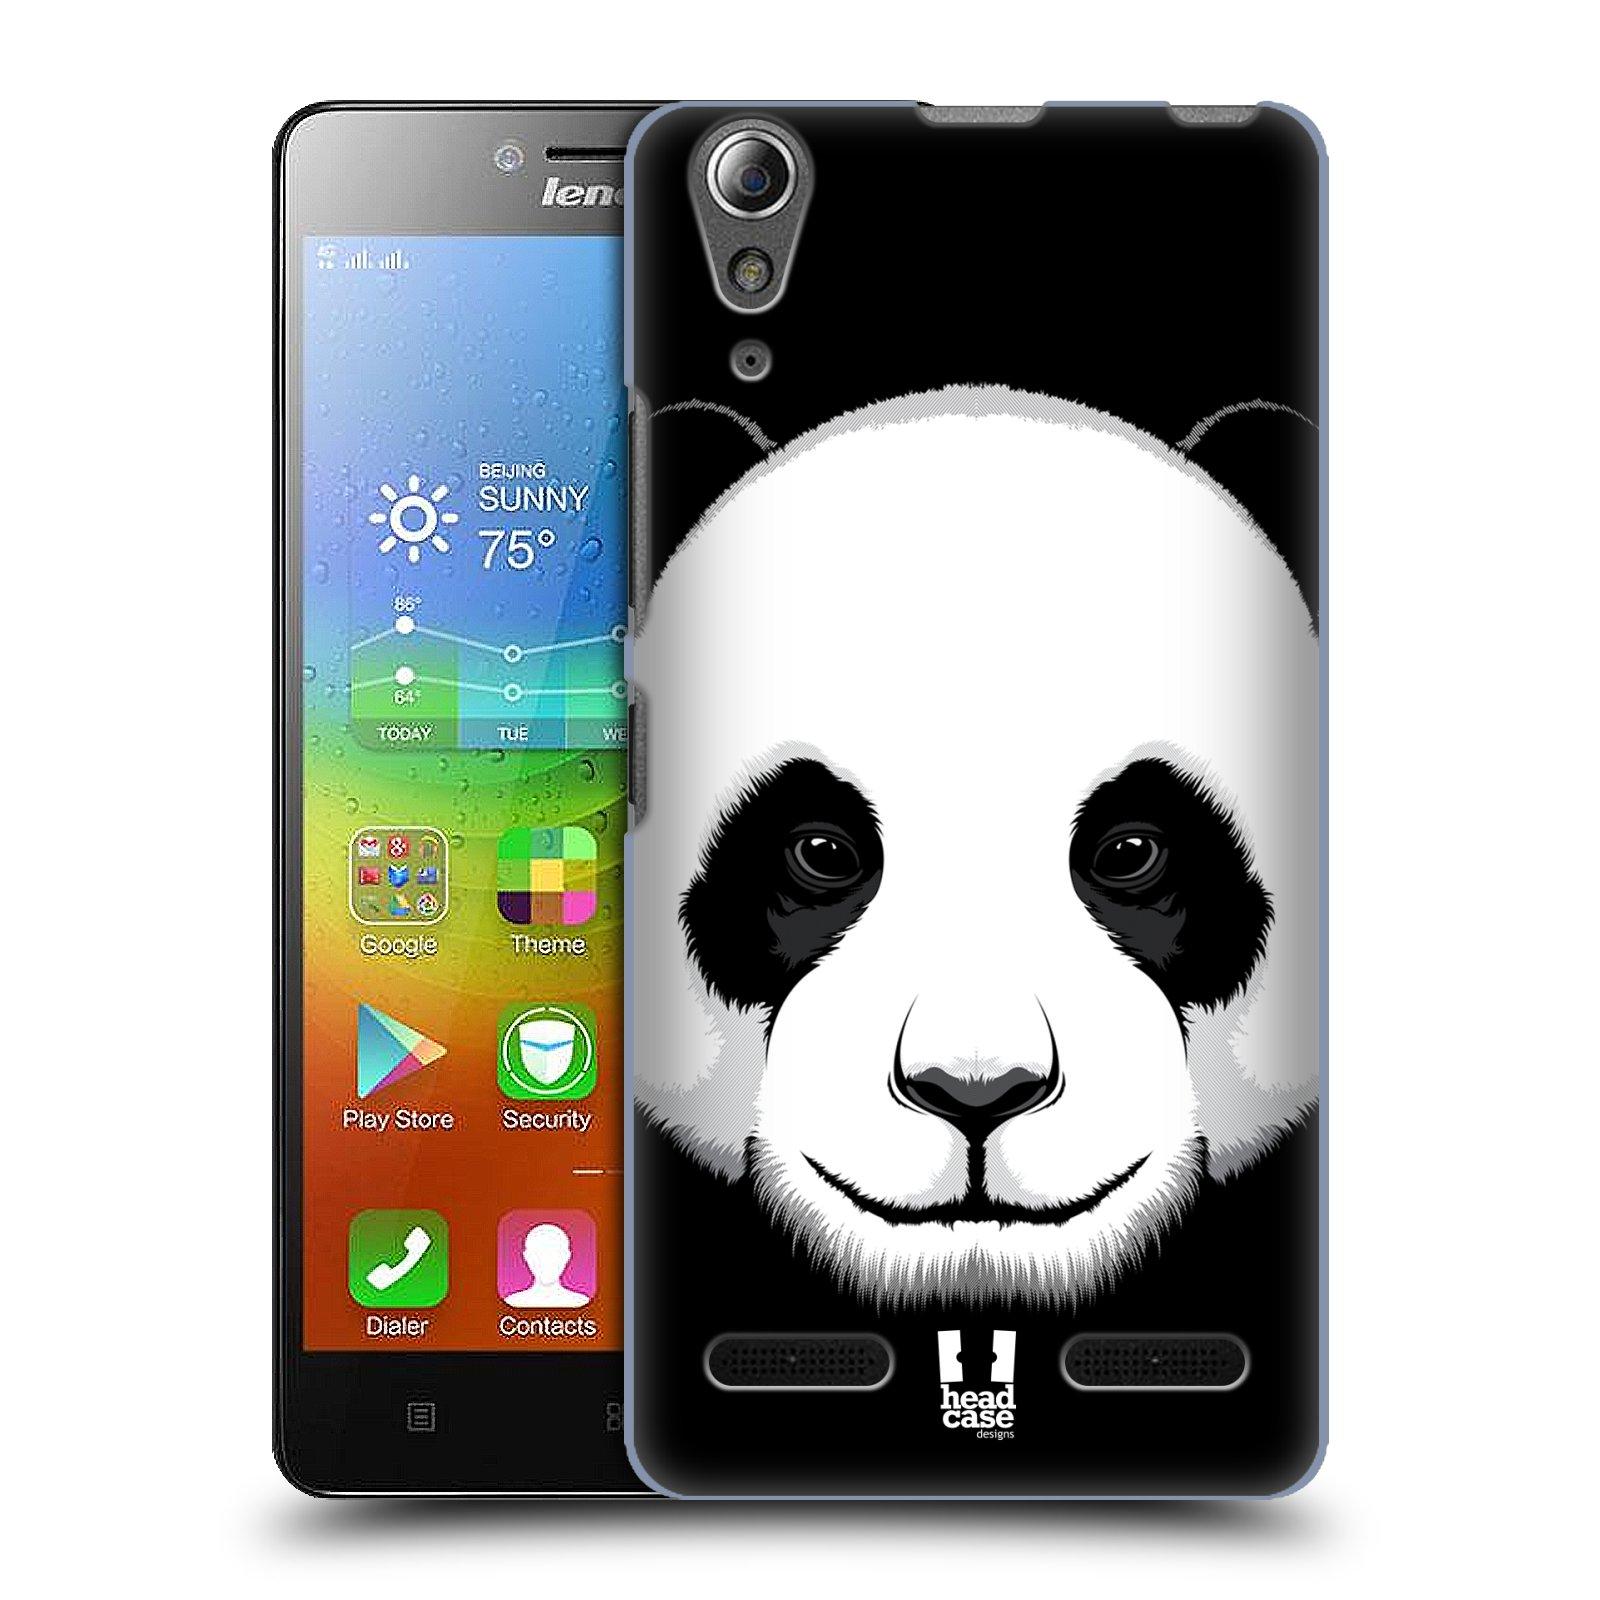 HEAD CASE pevný plastový obal na mobil LENOVO A6000 / A6000 PLUS vzor Zvíře kreslená tvář panda